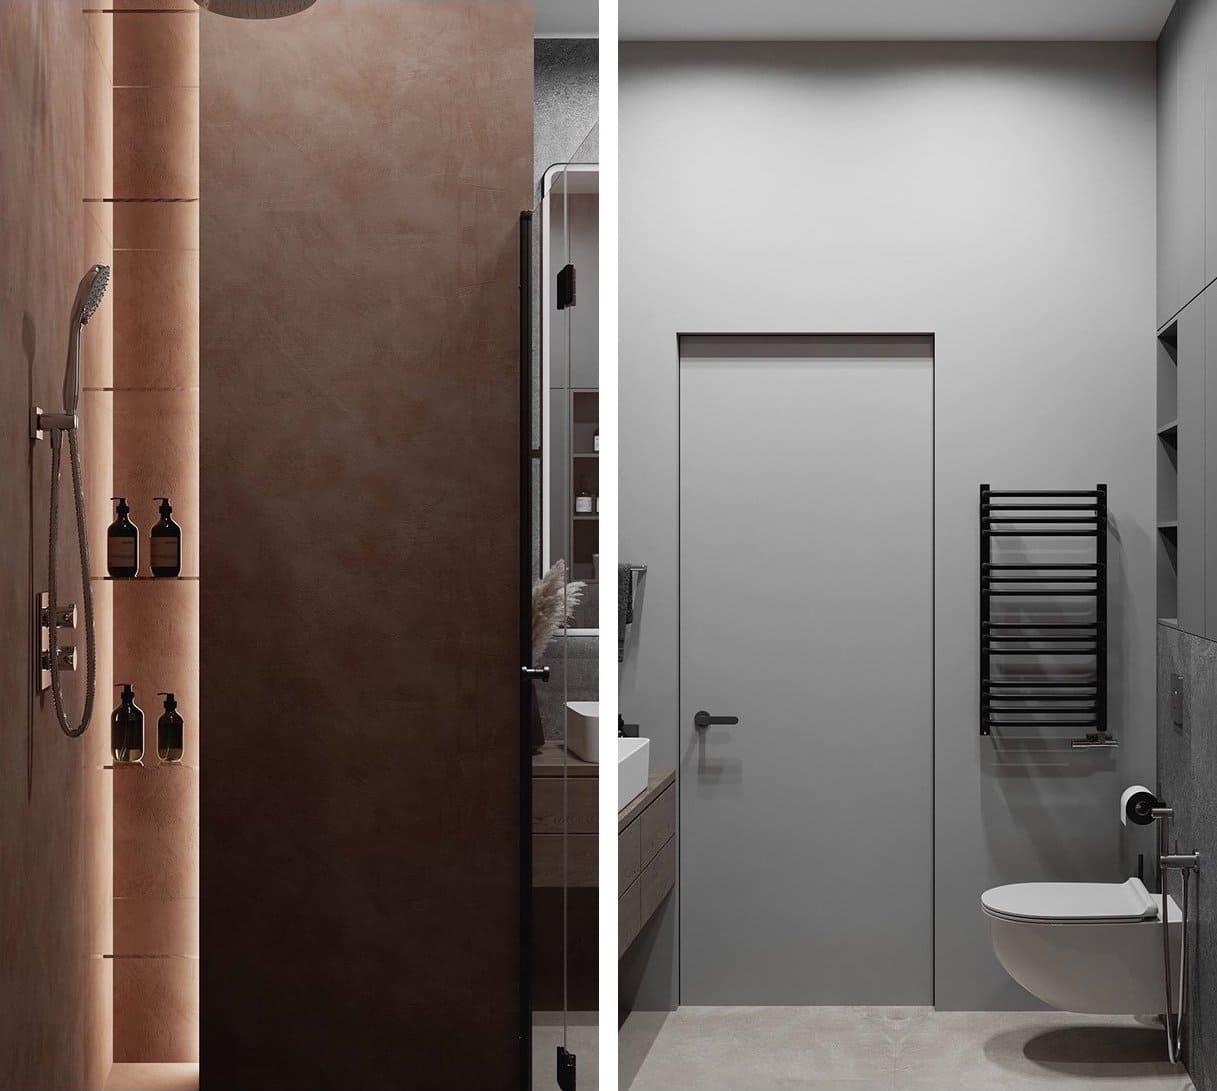 модный дизайн интерьера квартиры фото 12